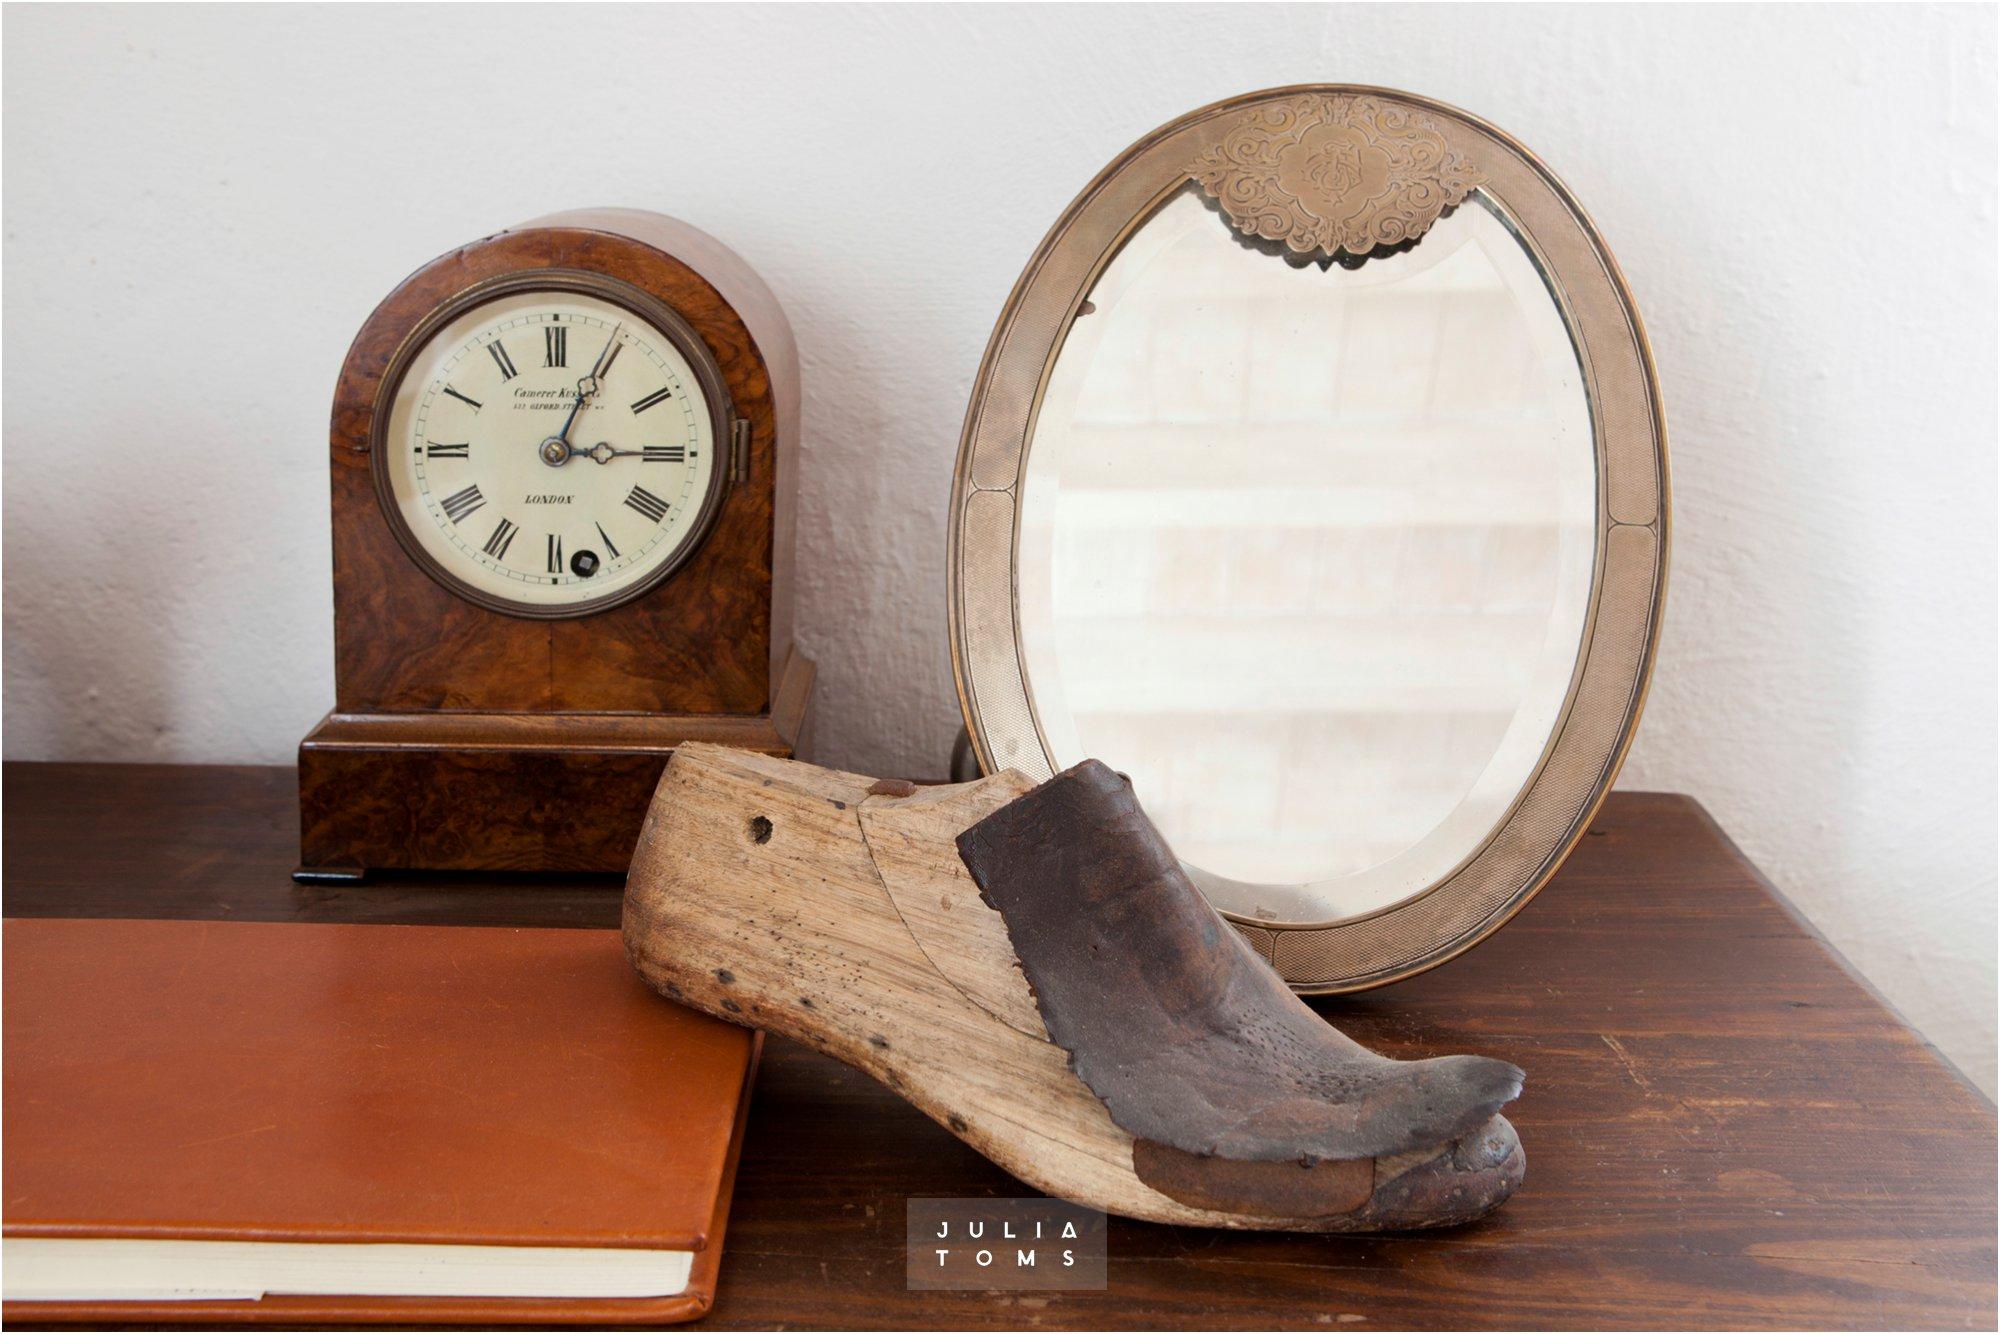 julia_toms_photography_interiors_magazine_004.jpg